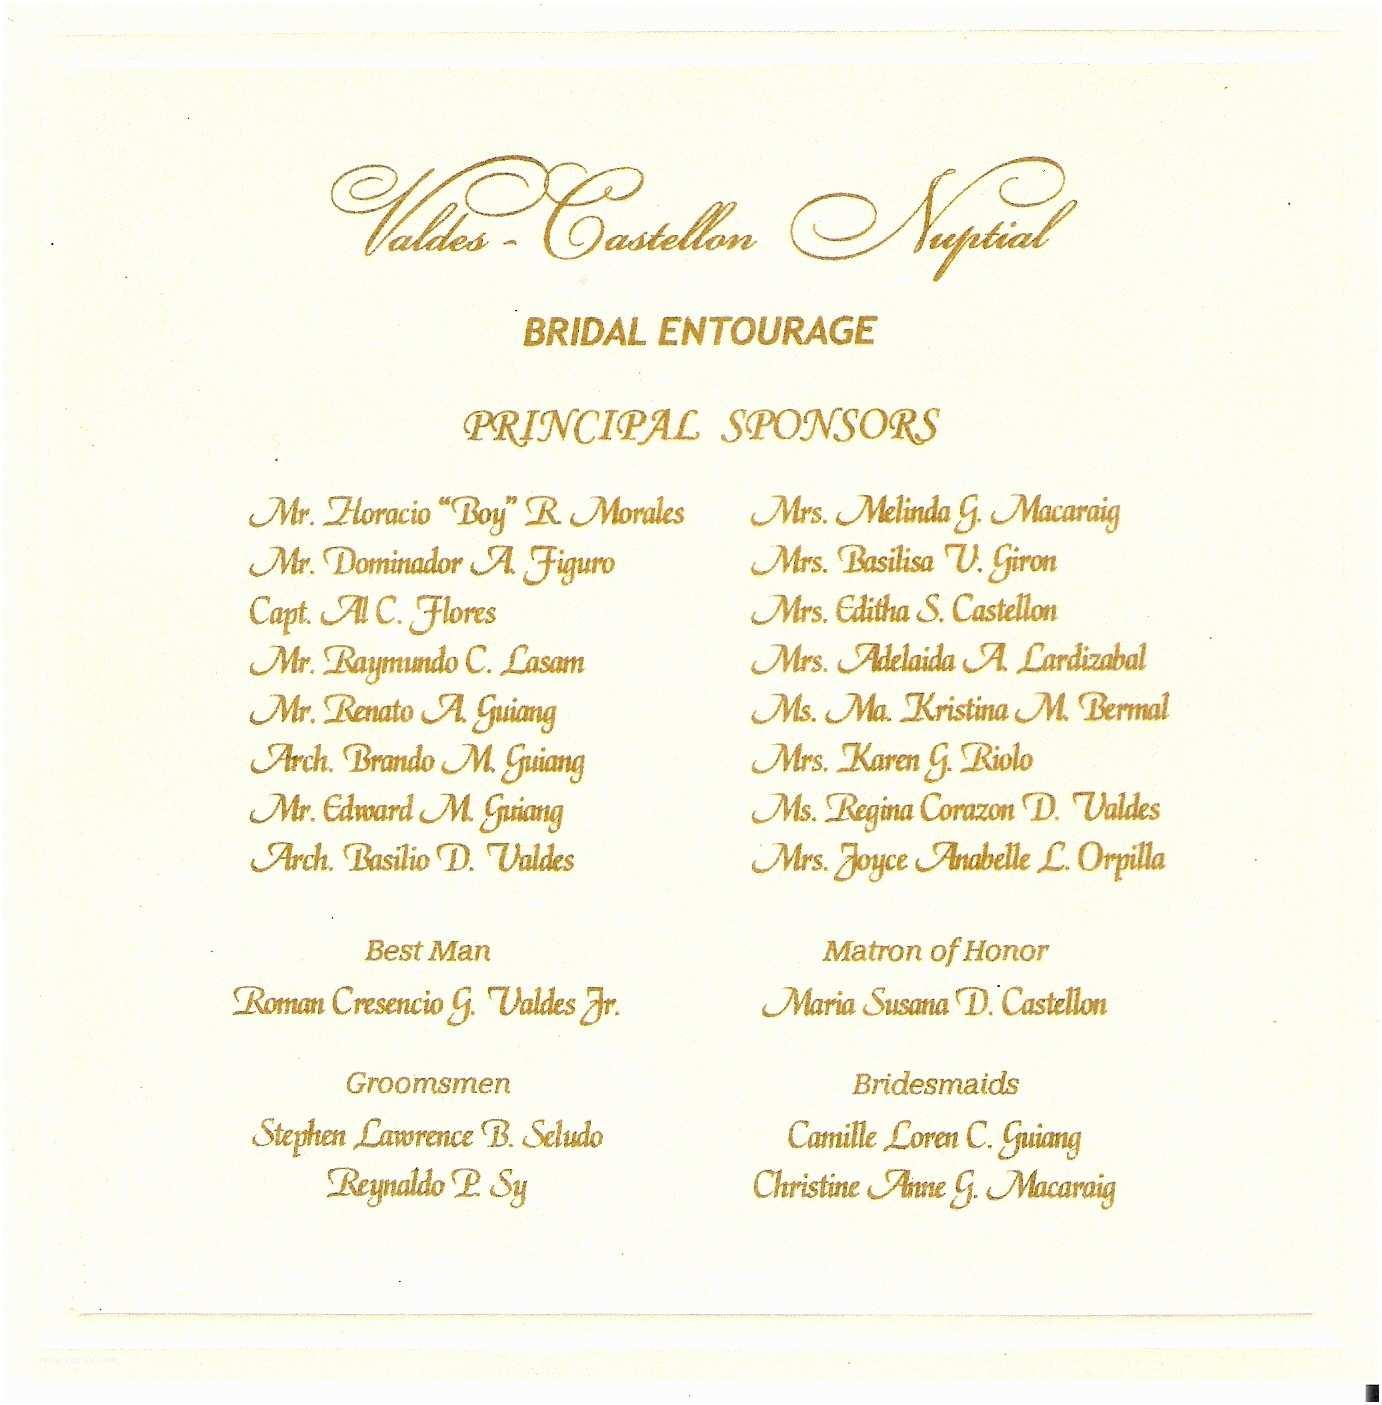 Wedding Invitation Checklist Wedding Entourage List Invitation Sample